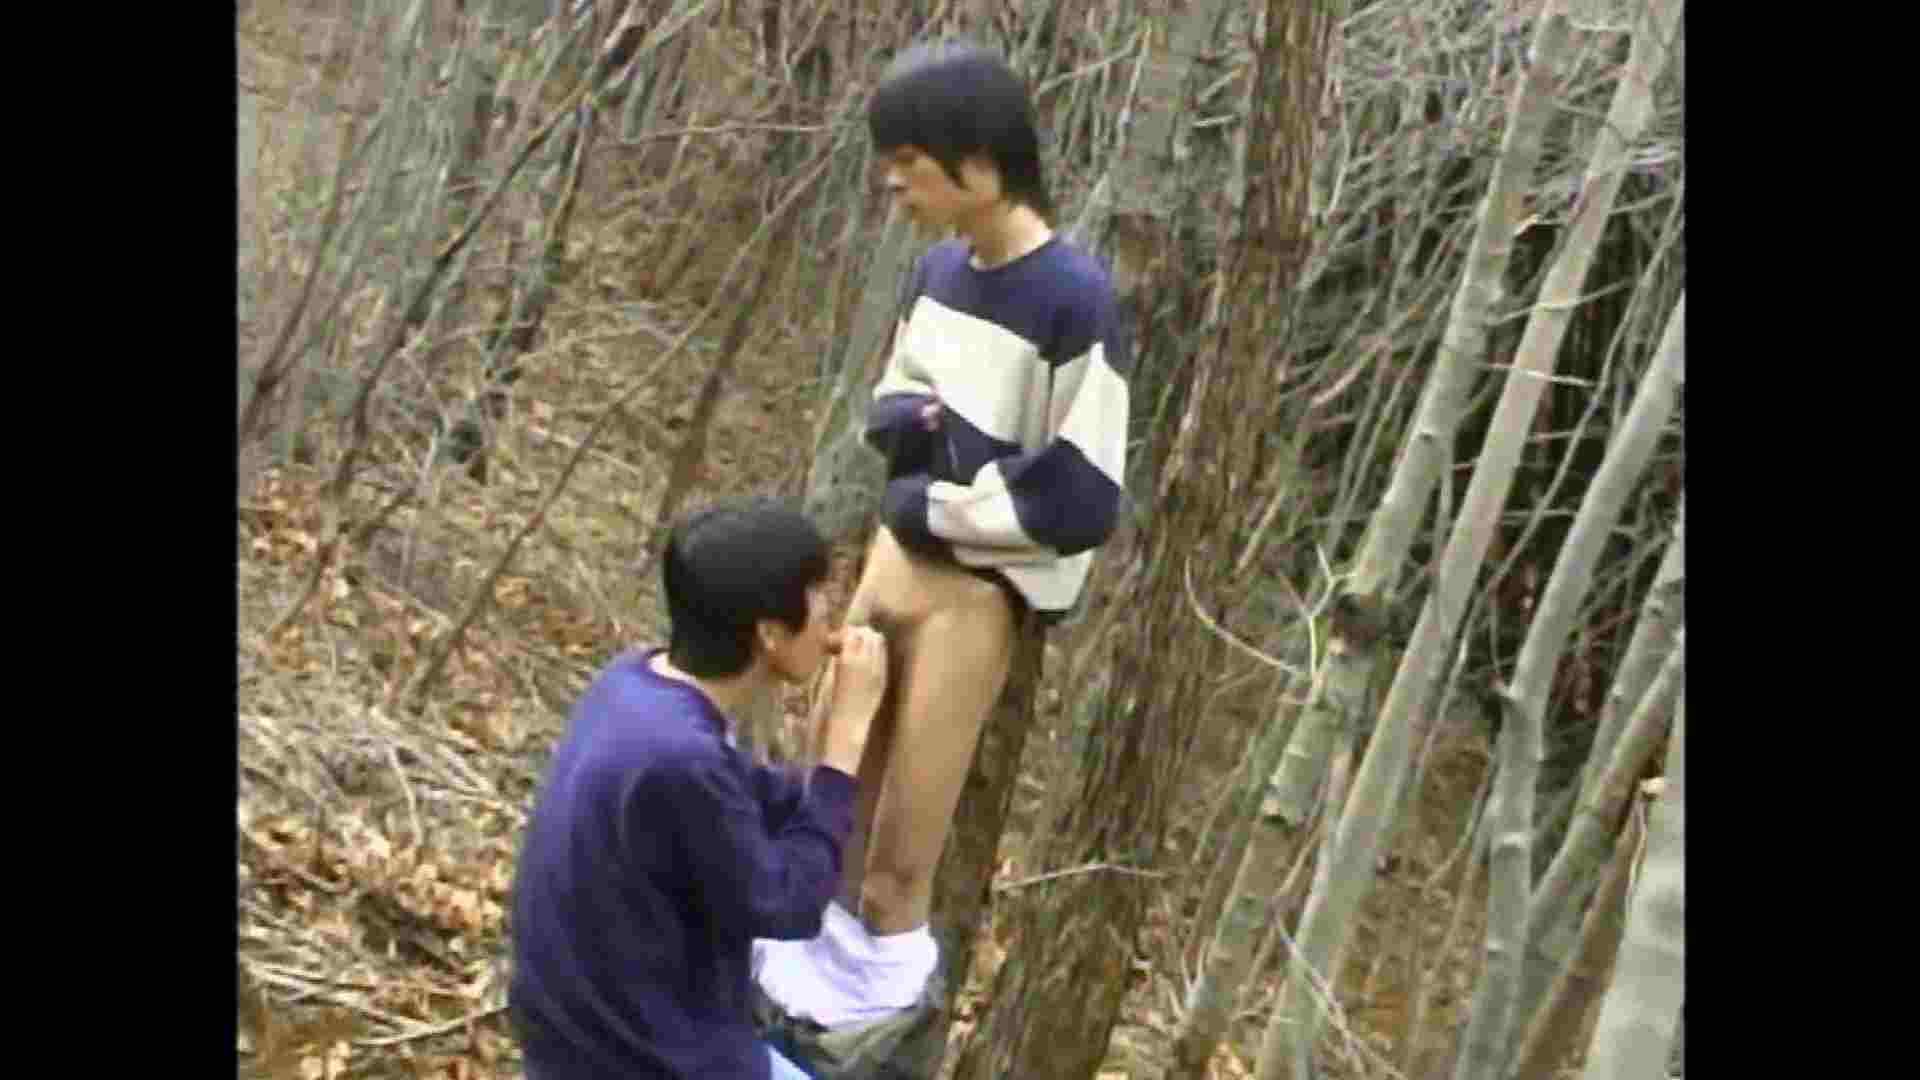 GAYBOY宏のオカズ倉庫Vol.5-4 アナル天国 | 口内発射特集 ゲイ発射もろ画像 9連発 3